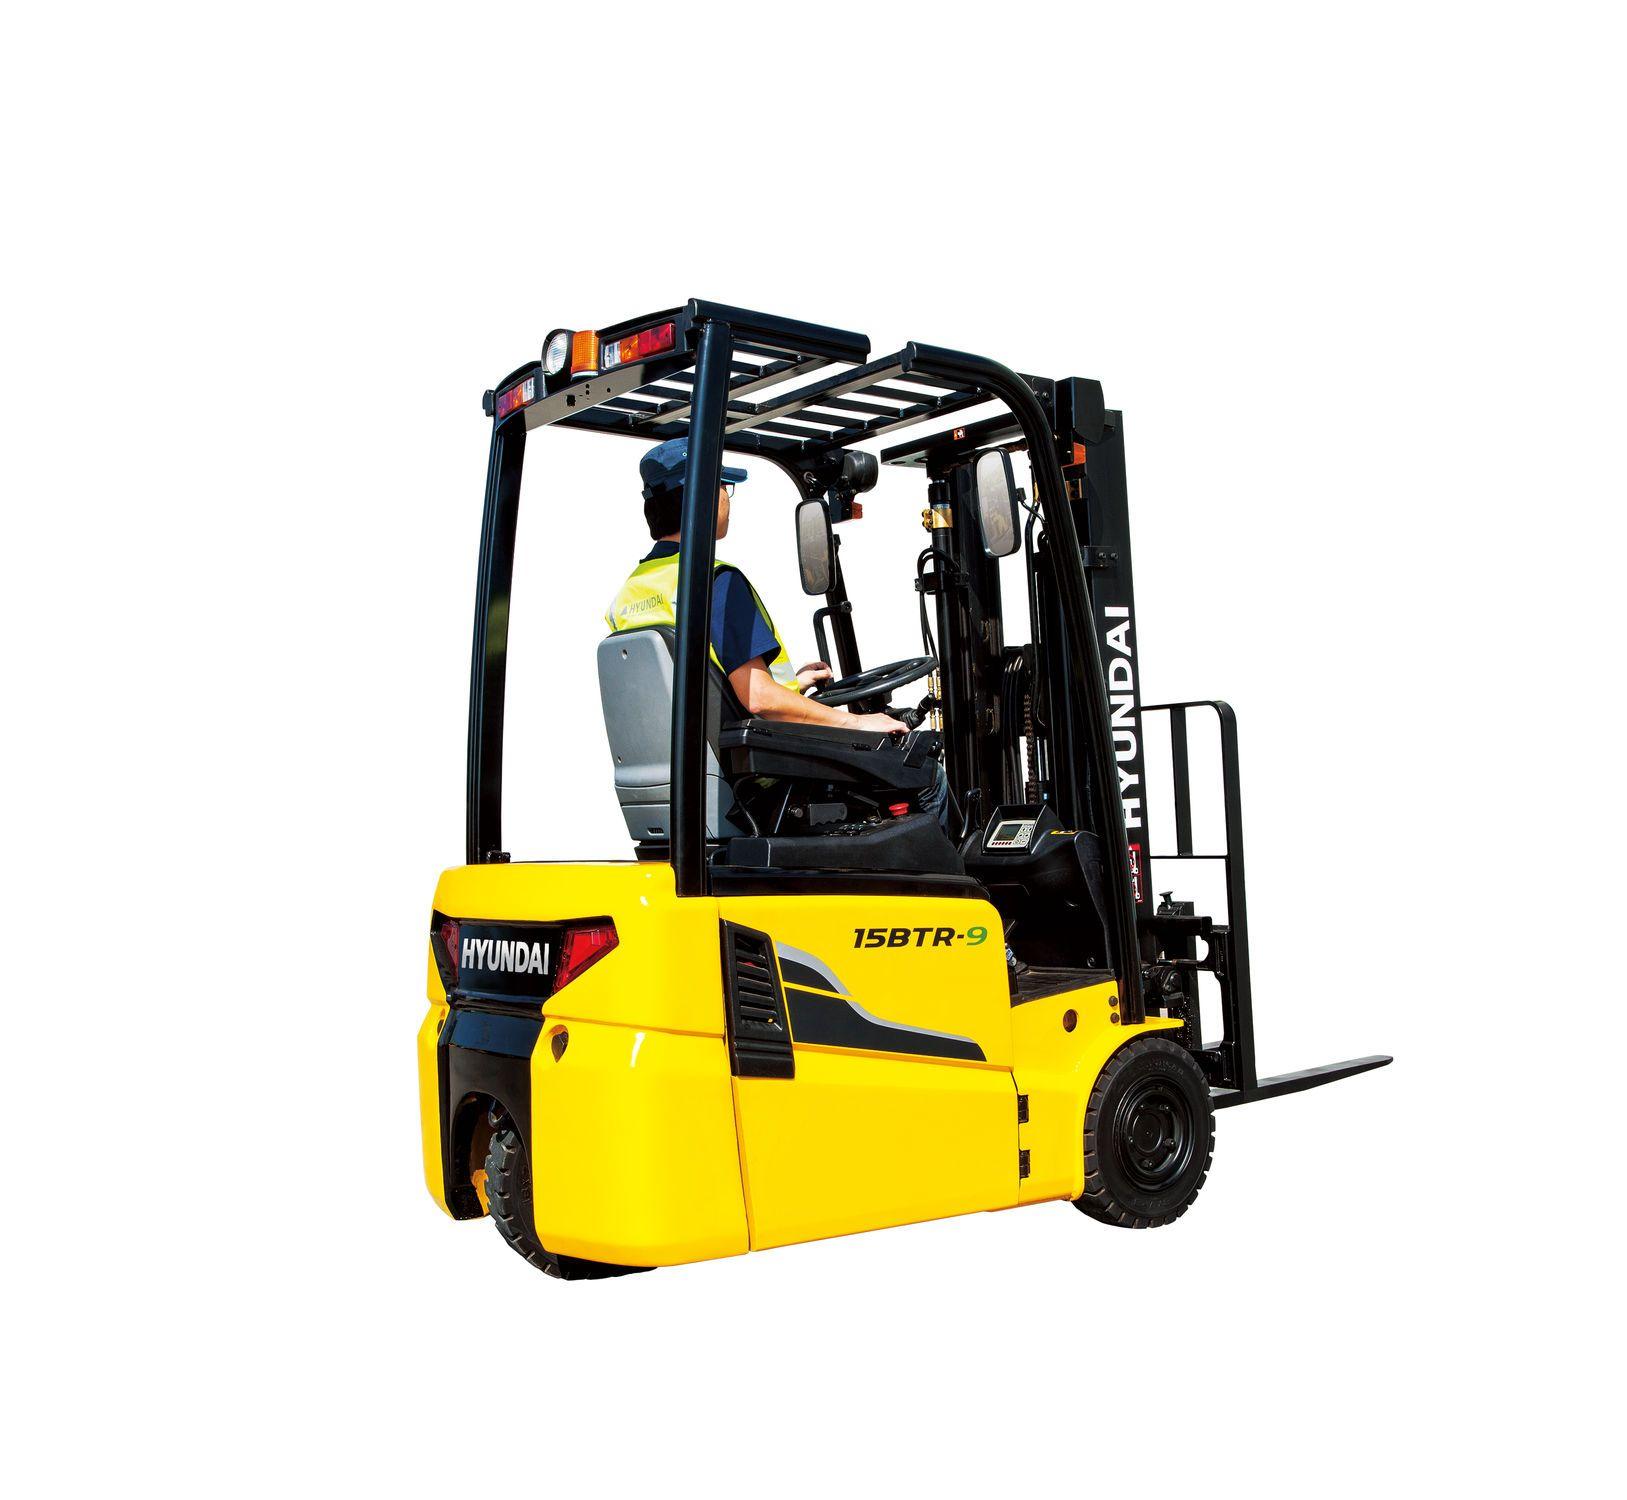 Hyundai forklift truck 16b9 / 18b9 / 20b9 service